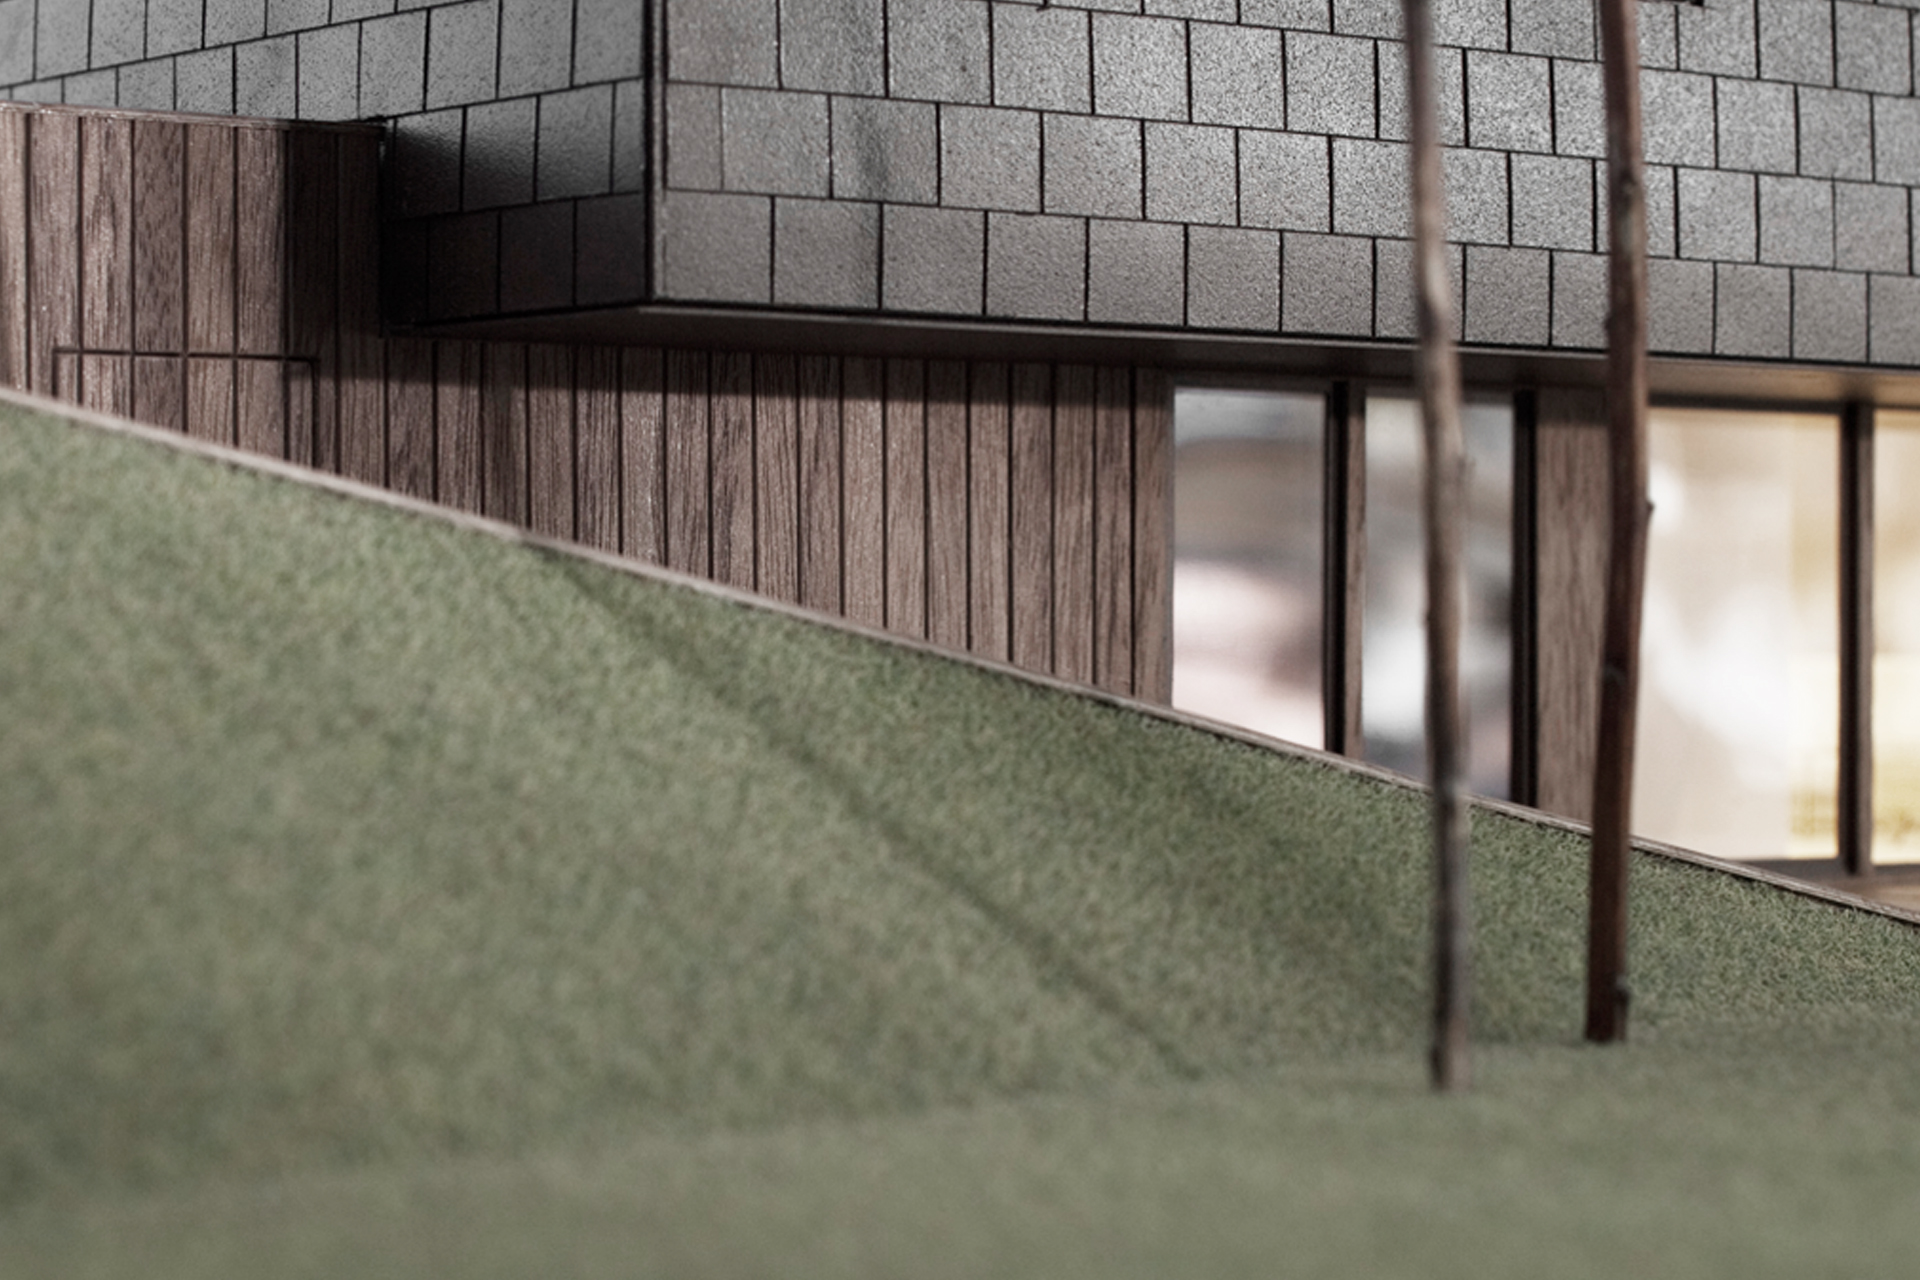 onimo-makiety-architektoniczne-PAG-slope-16f